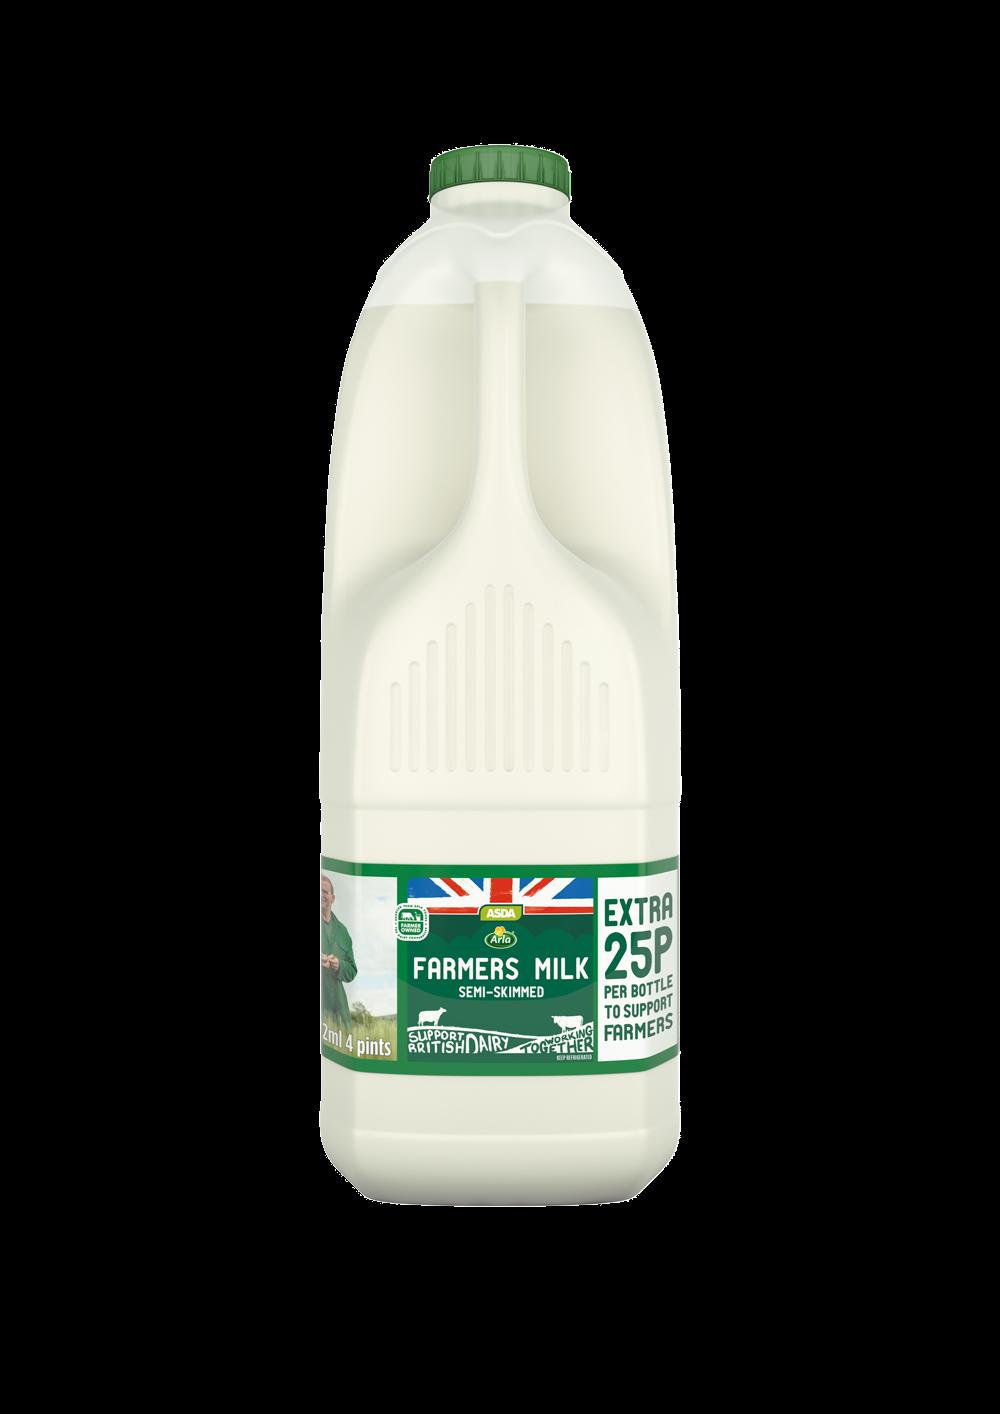 farmers-milk-semi